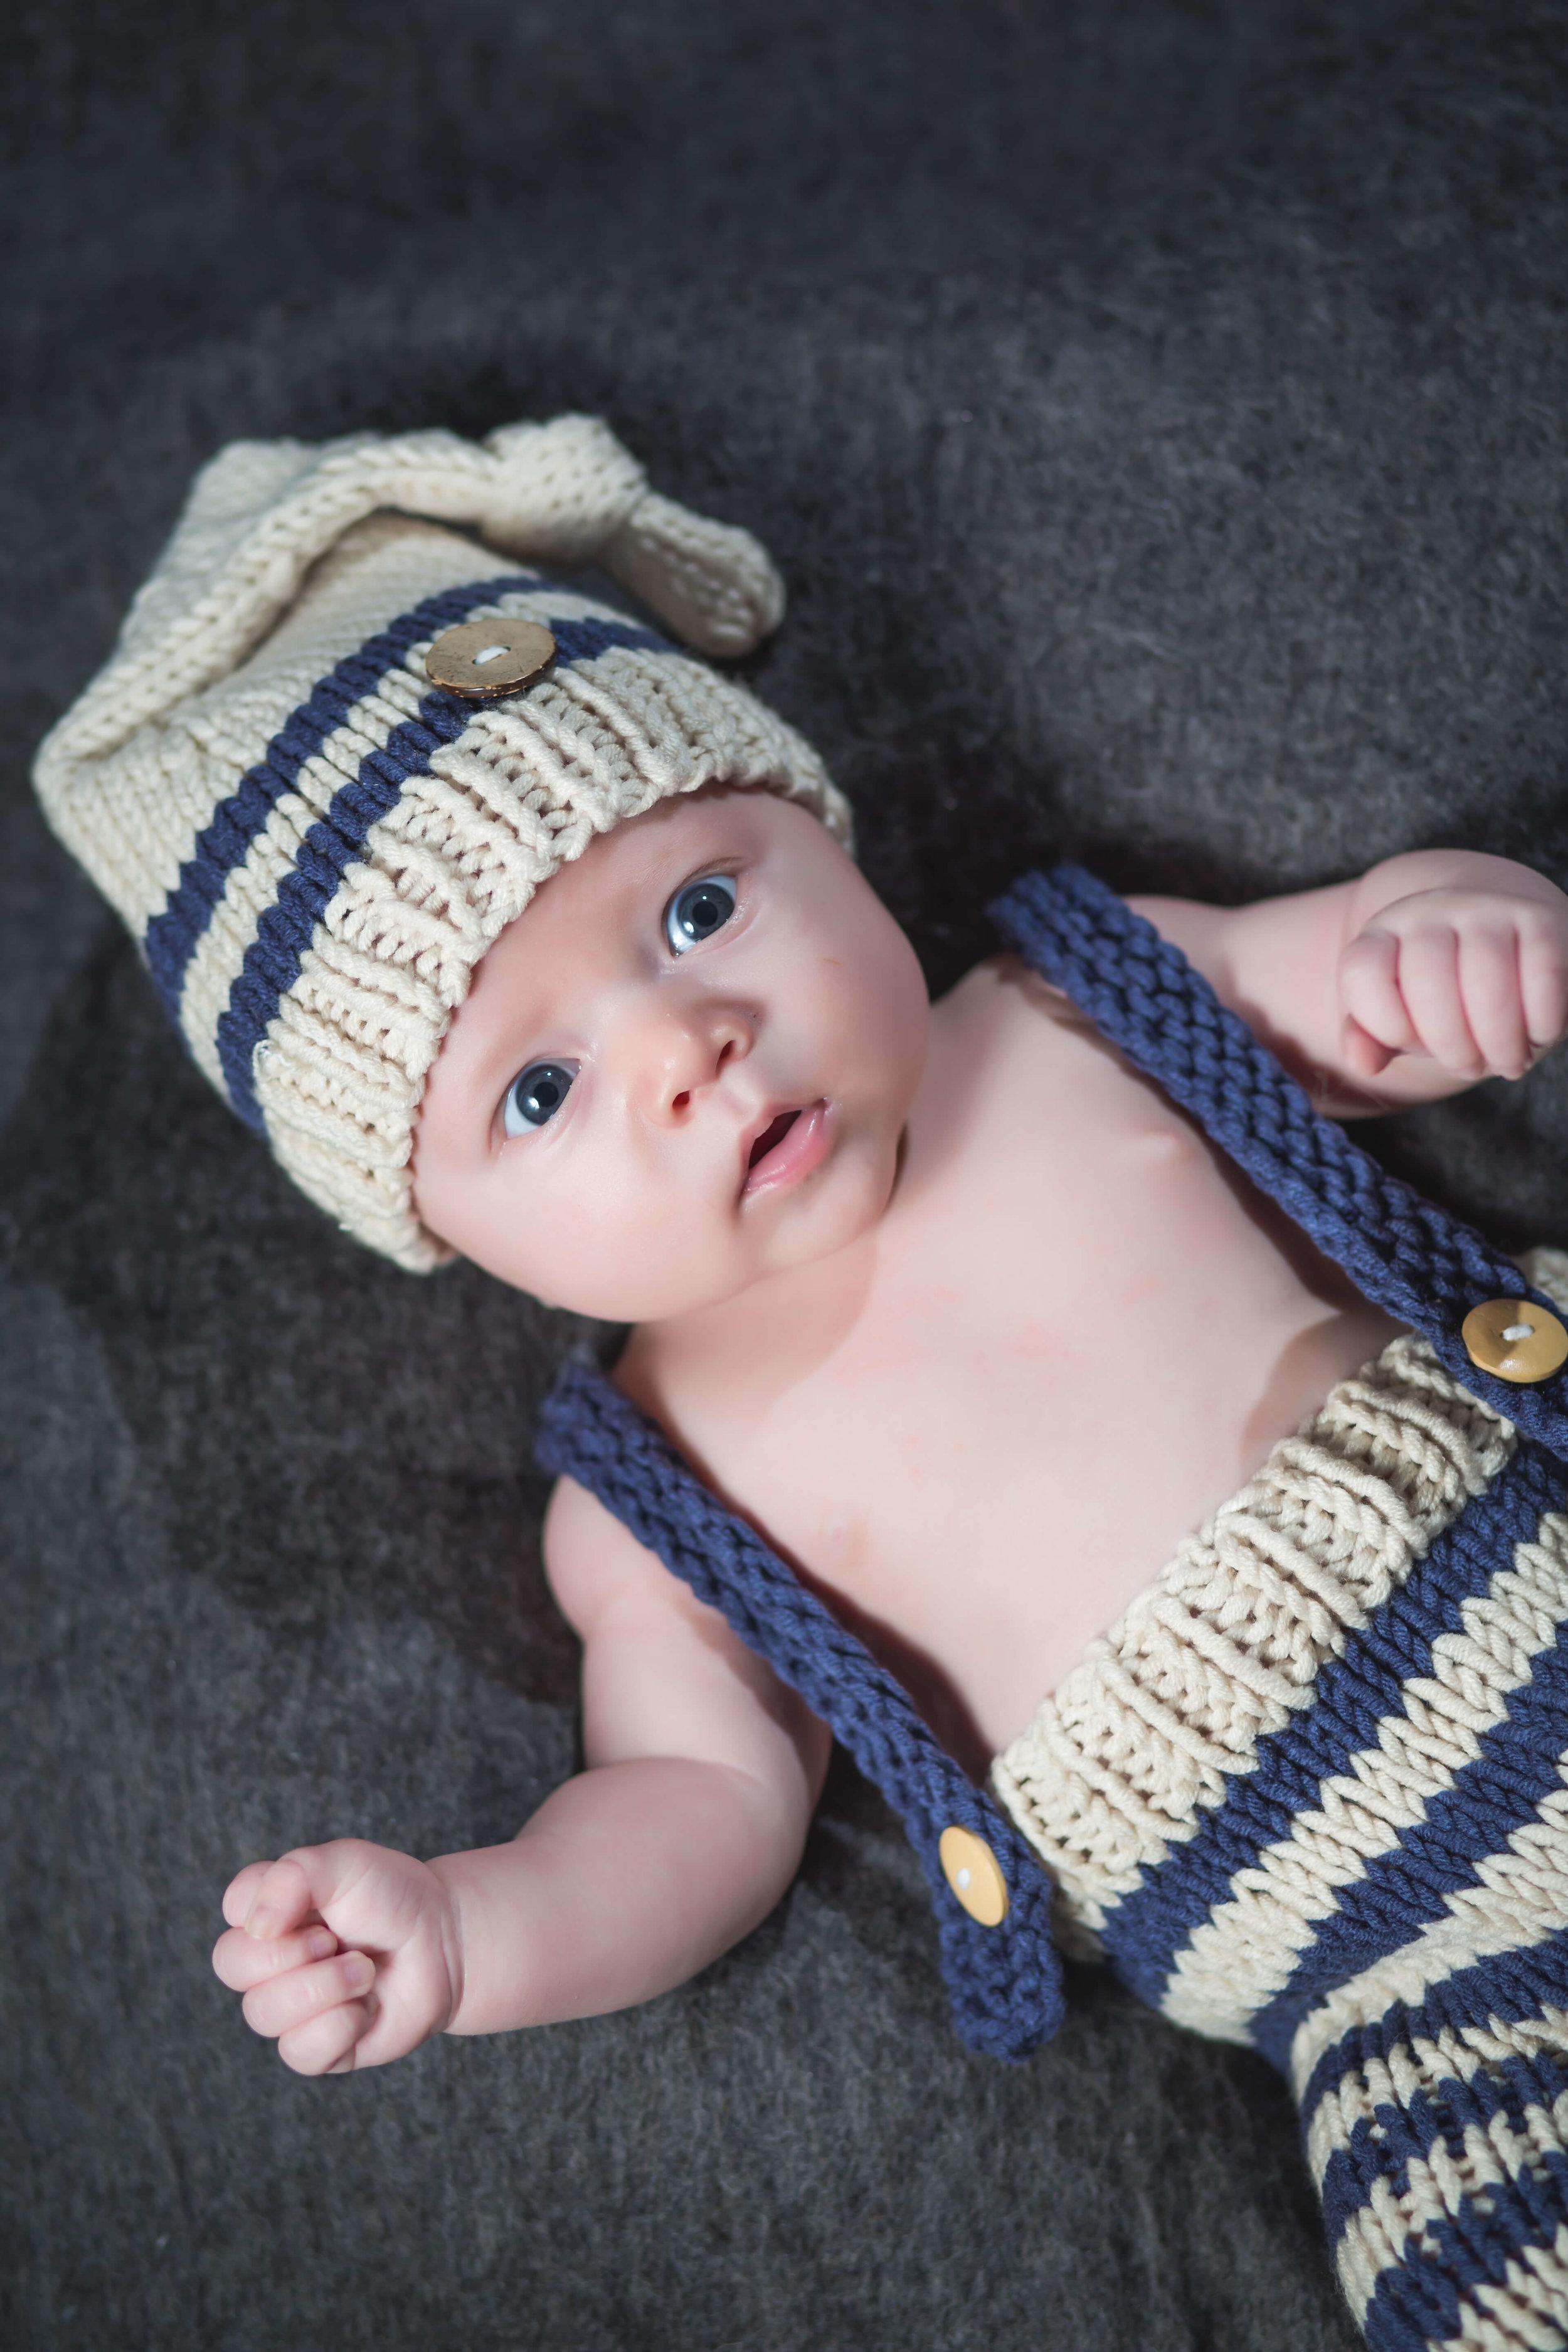 family-baby-newborn-childrens-photography-fairport-ny-96.jpg